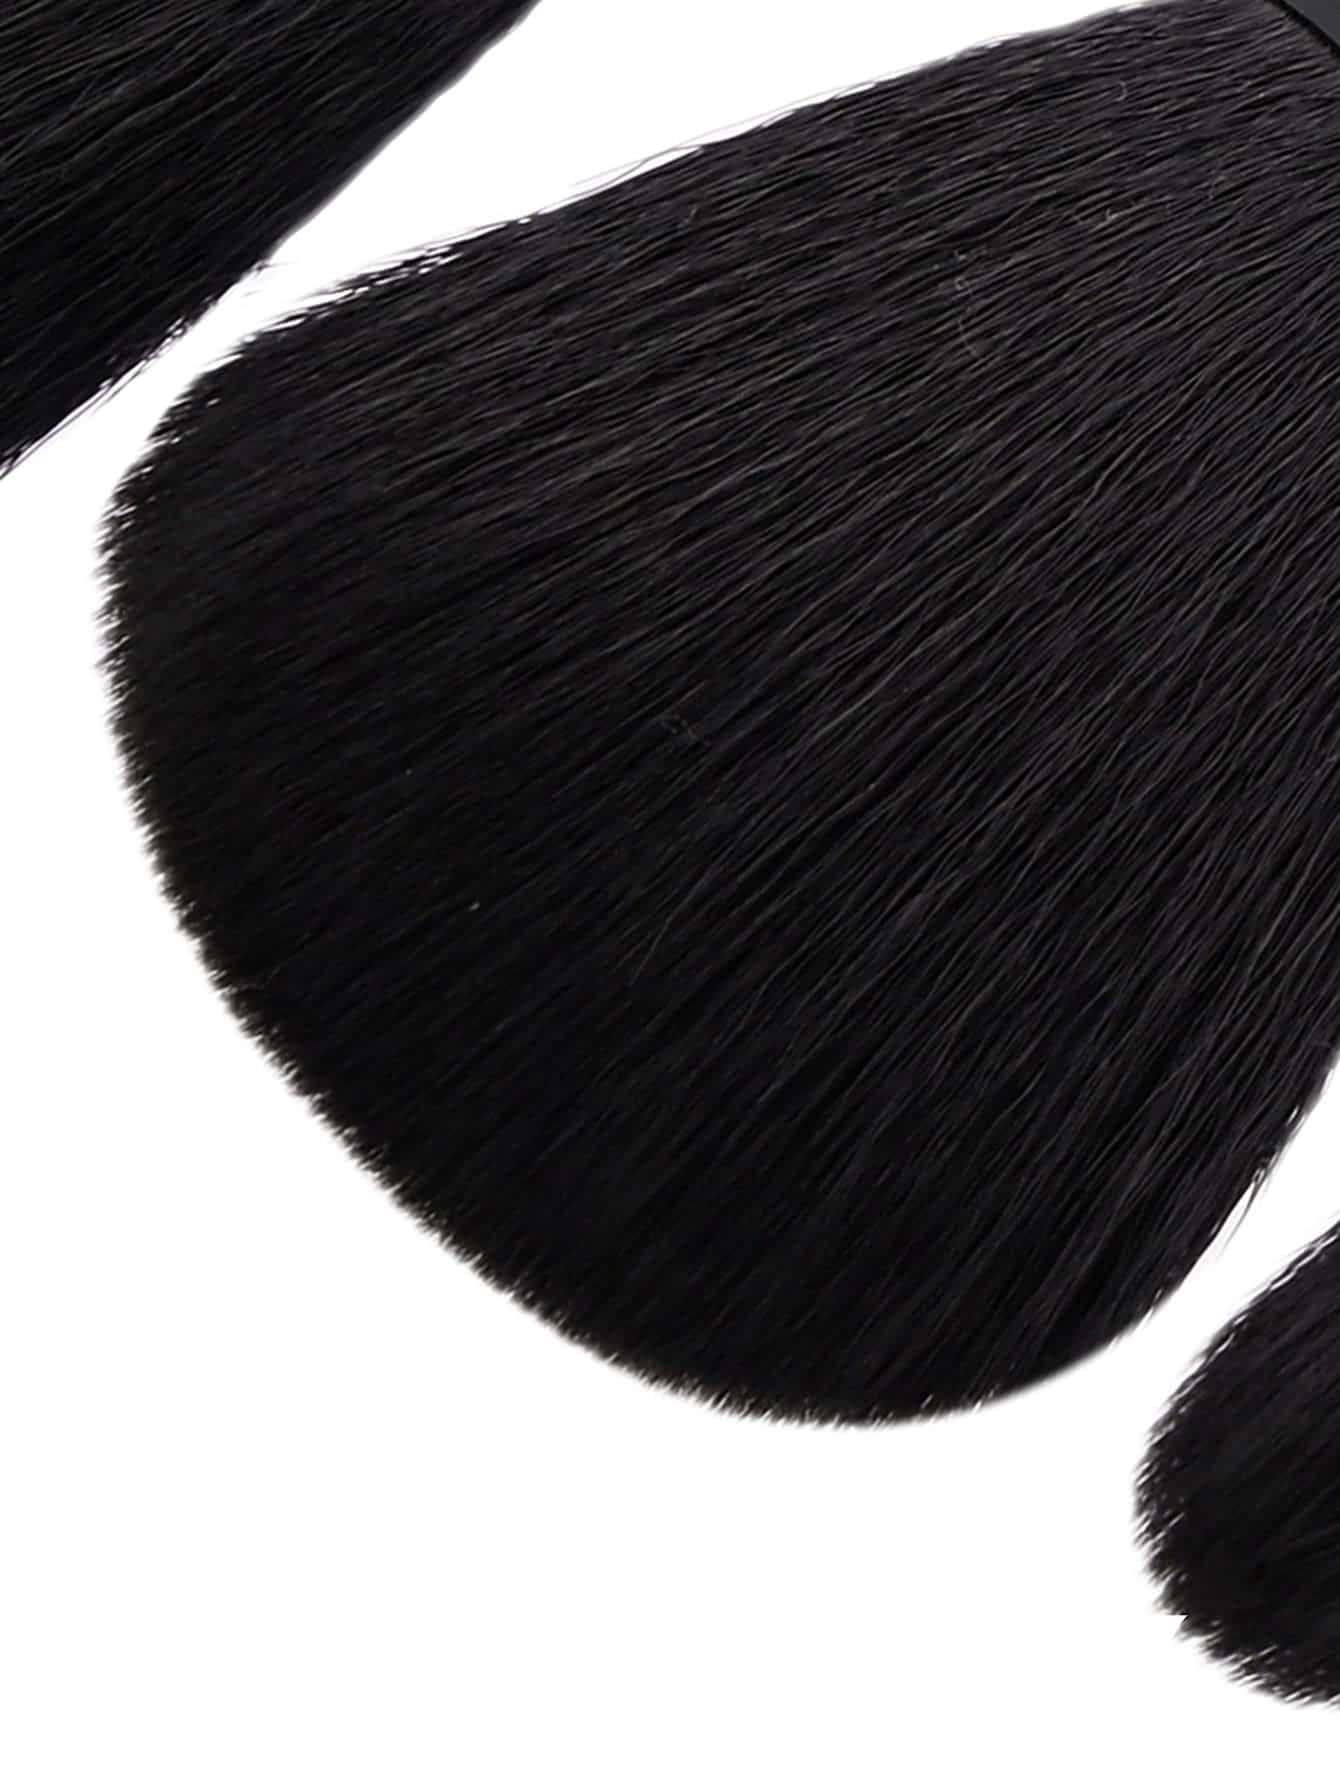 Professional 8pcs Faux Crystal Zircon Fiber Hair Makeup: Professional Makeup Brush 8pcs -SHEIN(SHEINSIDE